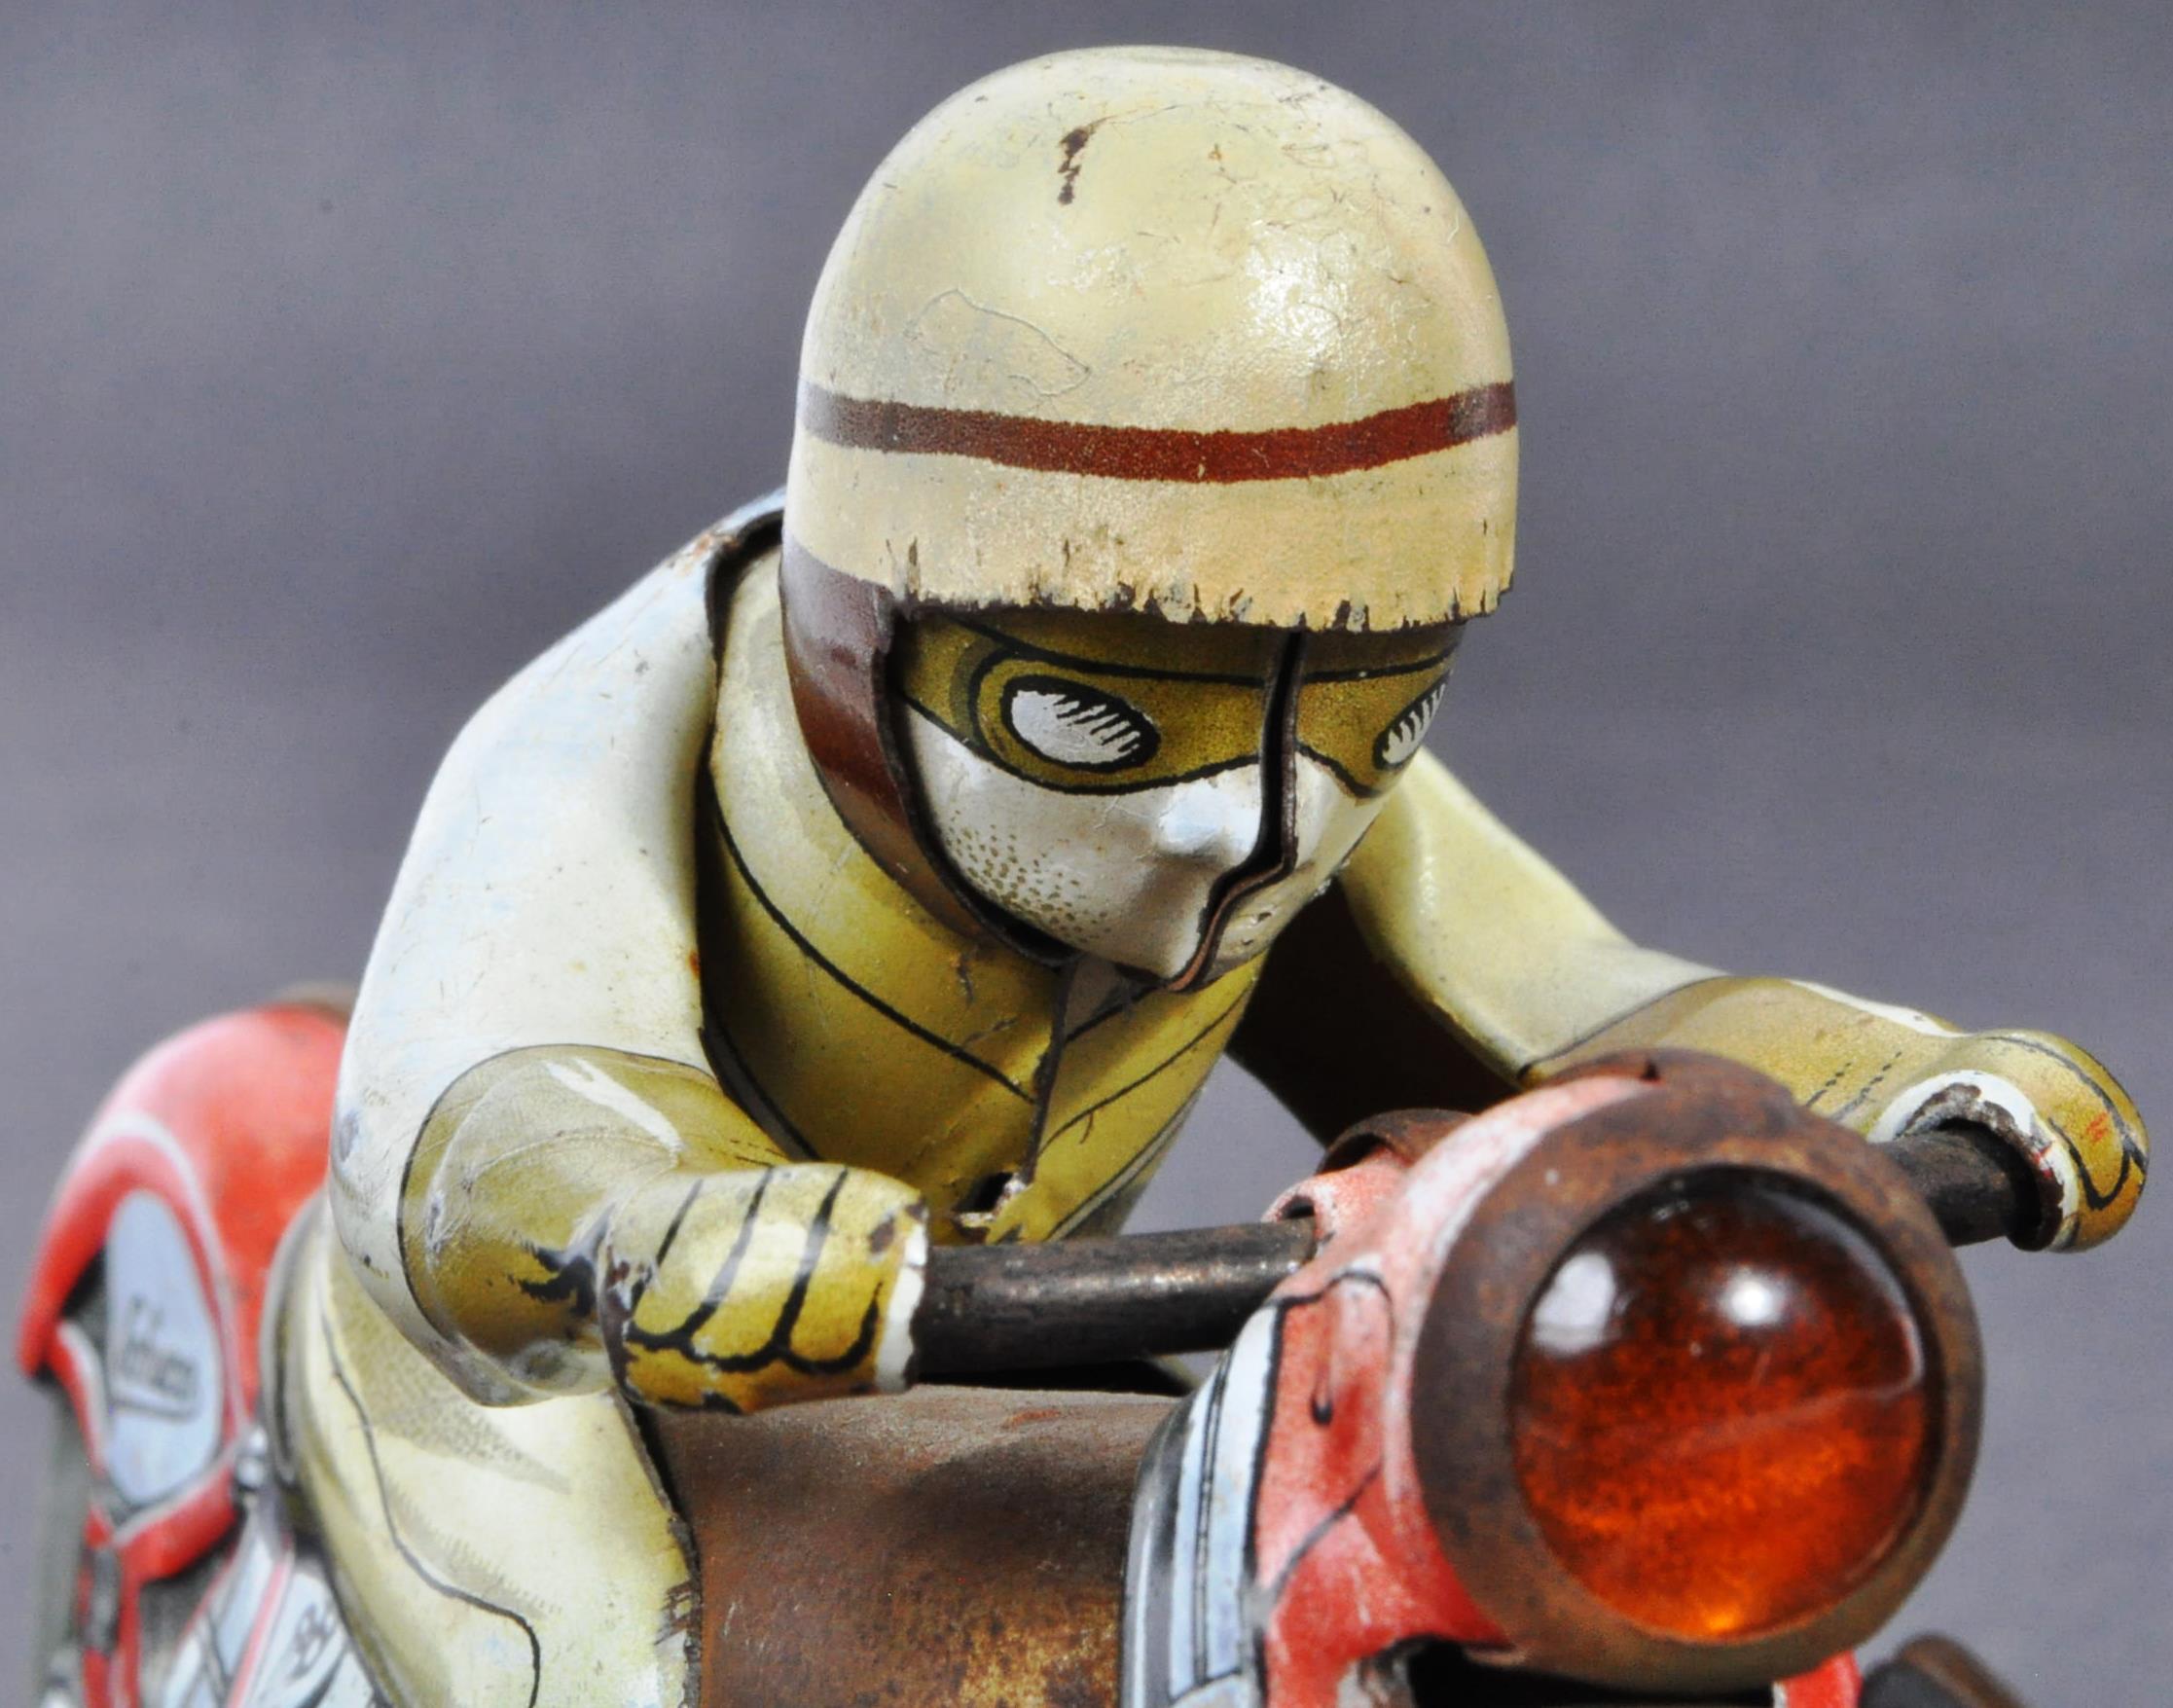 ORIGINAL VINTAGE SCHUCO TINPLATE RACING MOTORCYCLE - Image 6 of 8